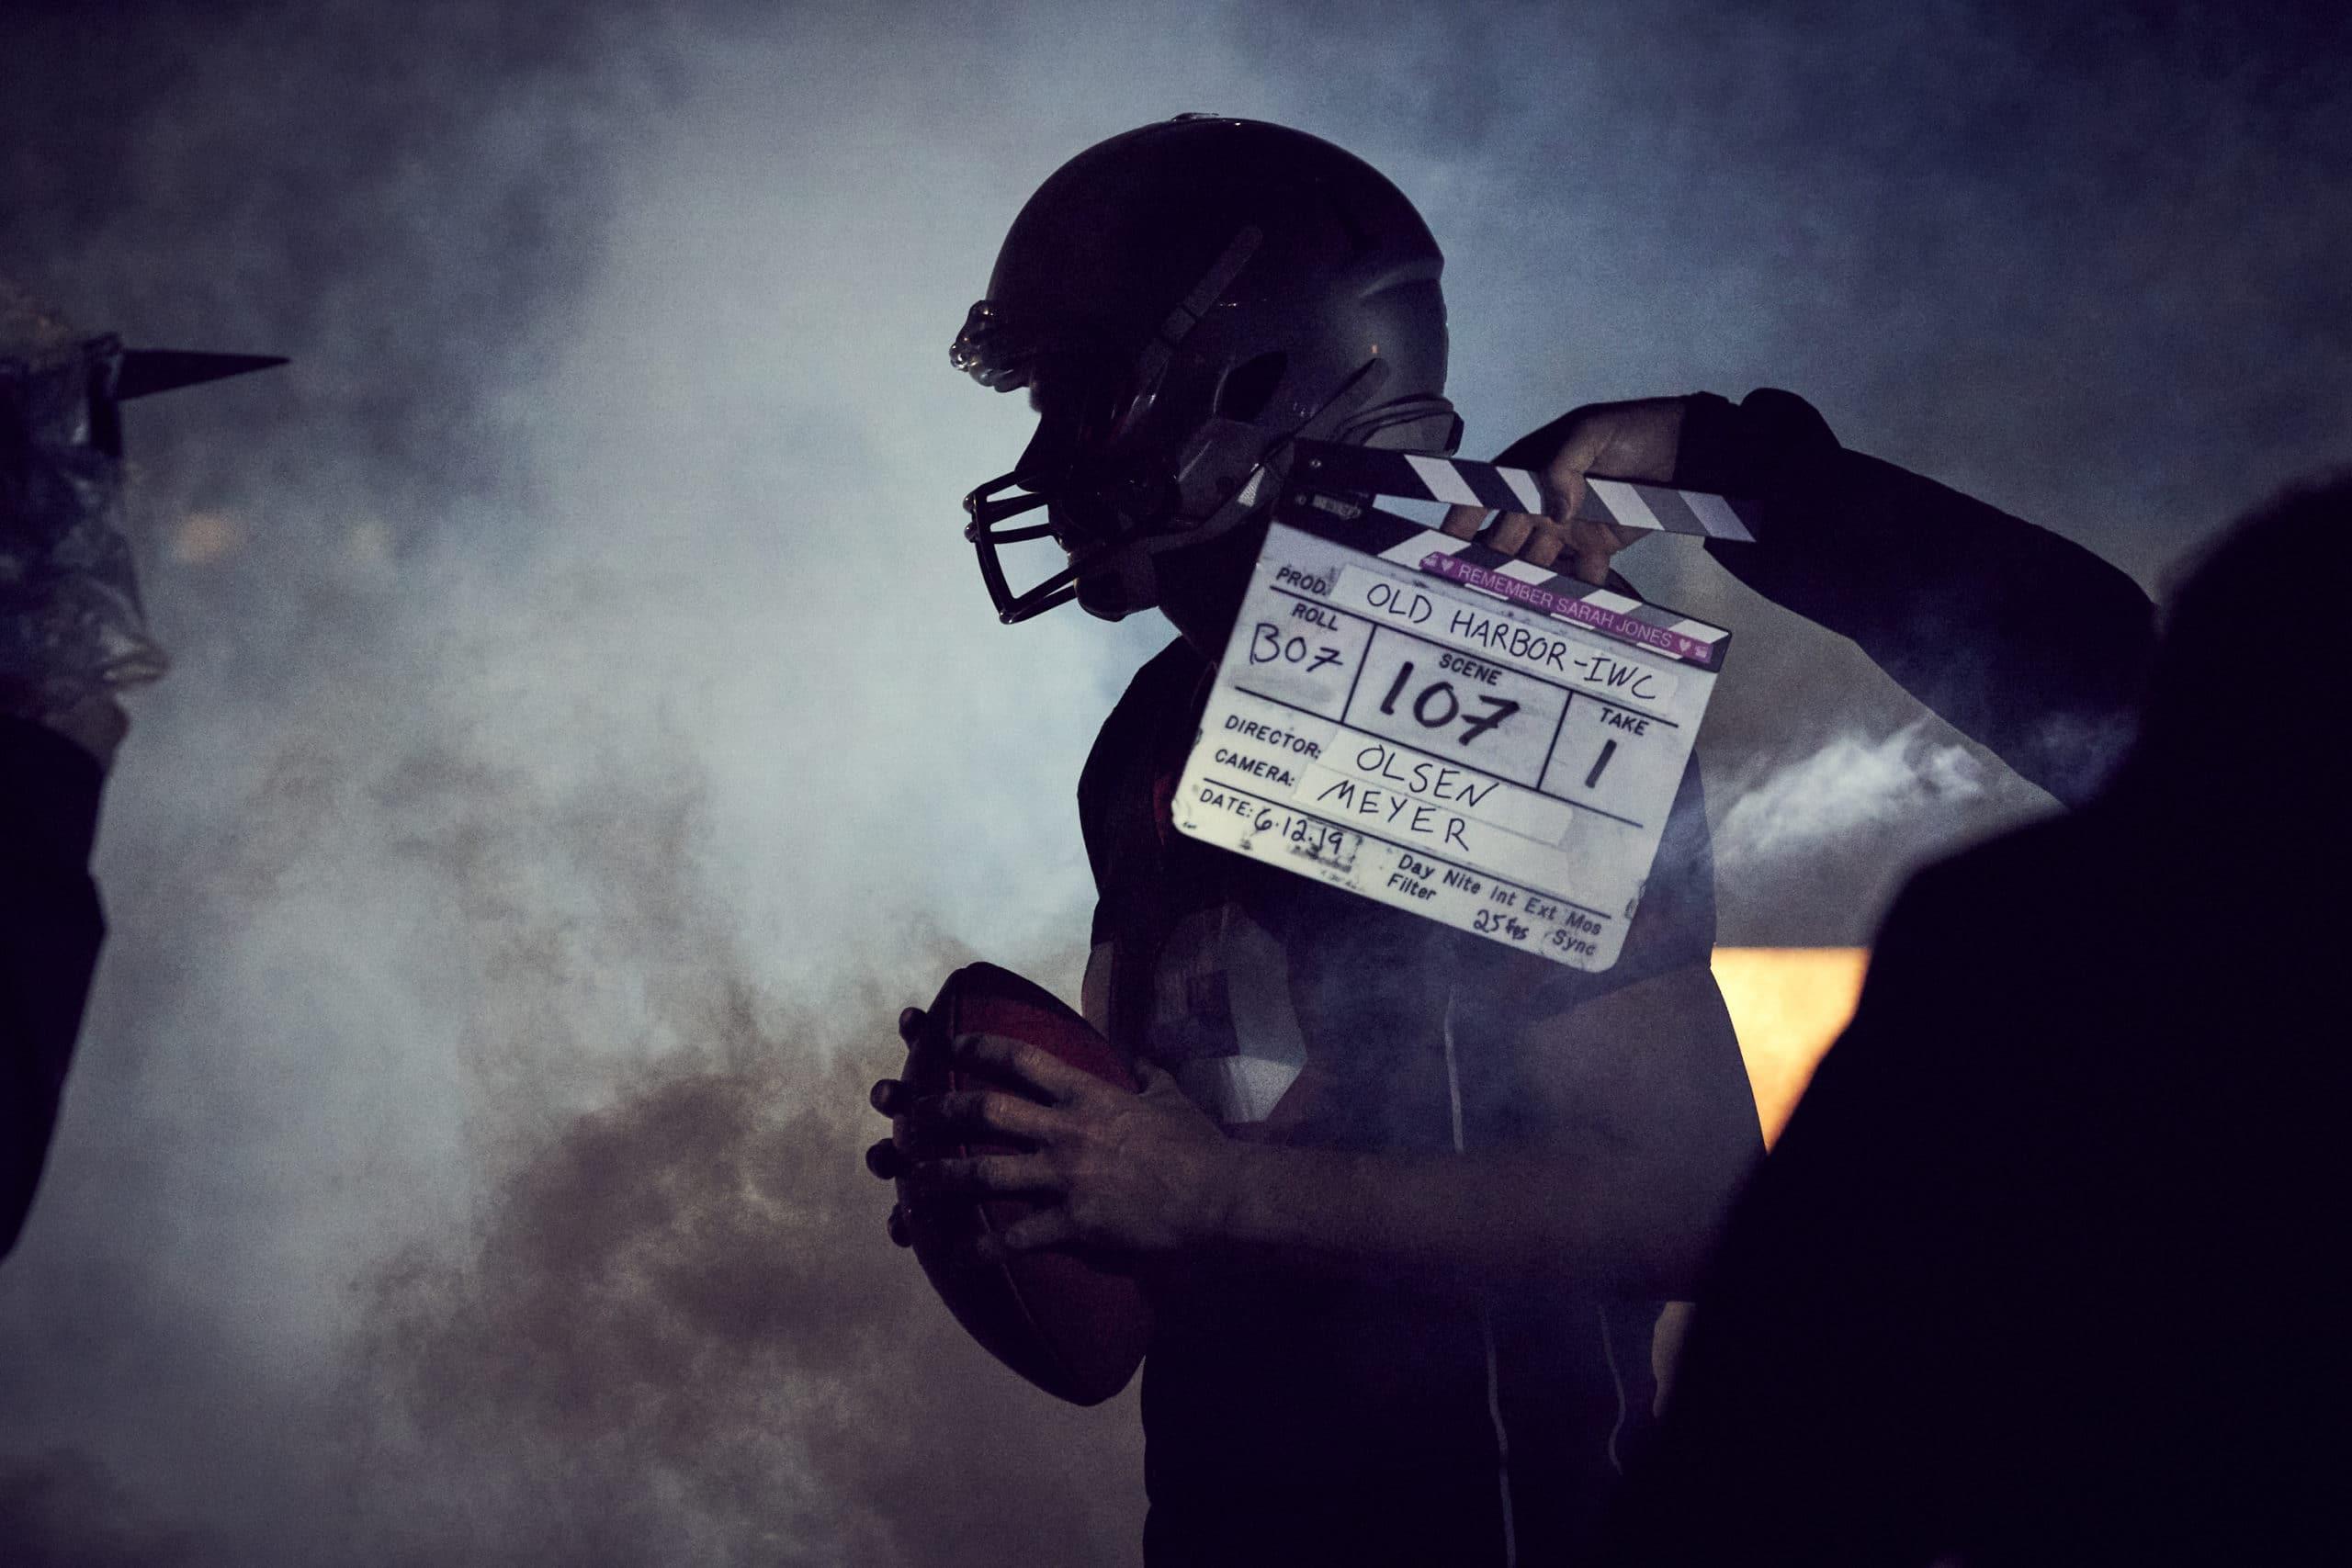 IWC Tom Brady Short Film